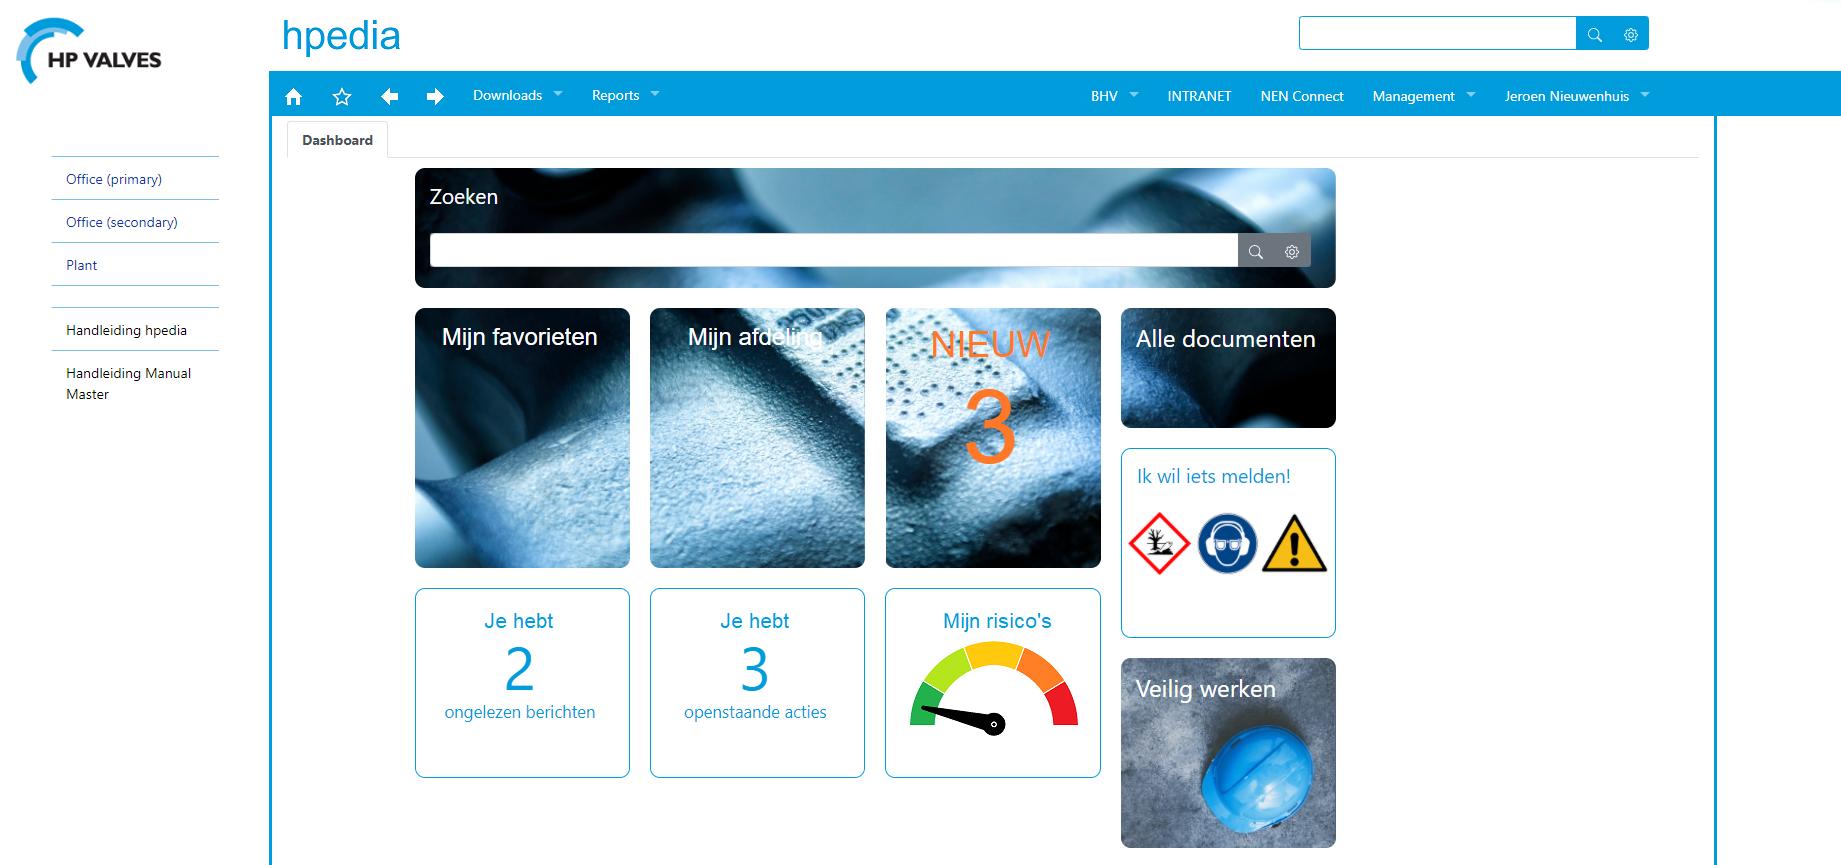 Startpagina Hpedia HP Valves